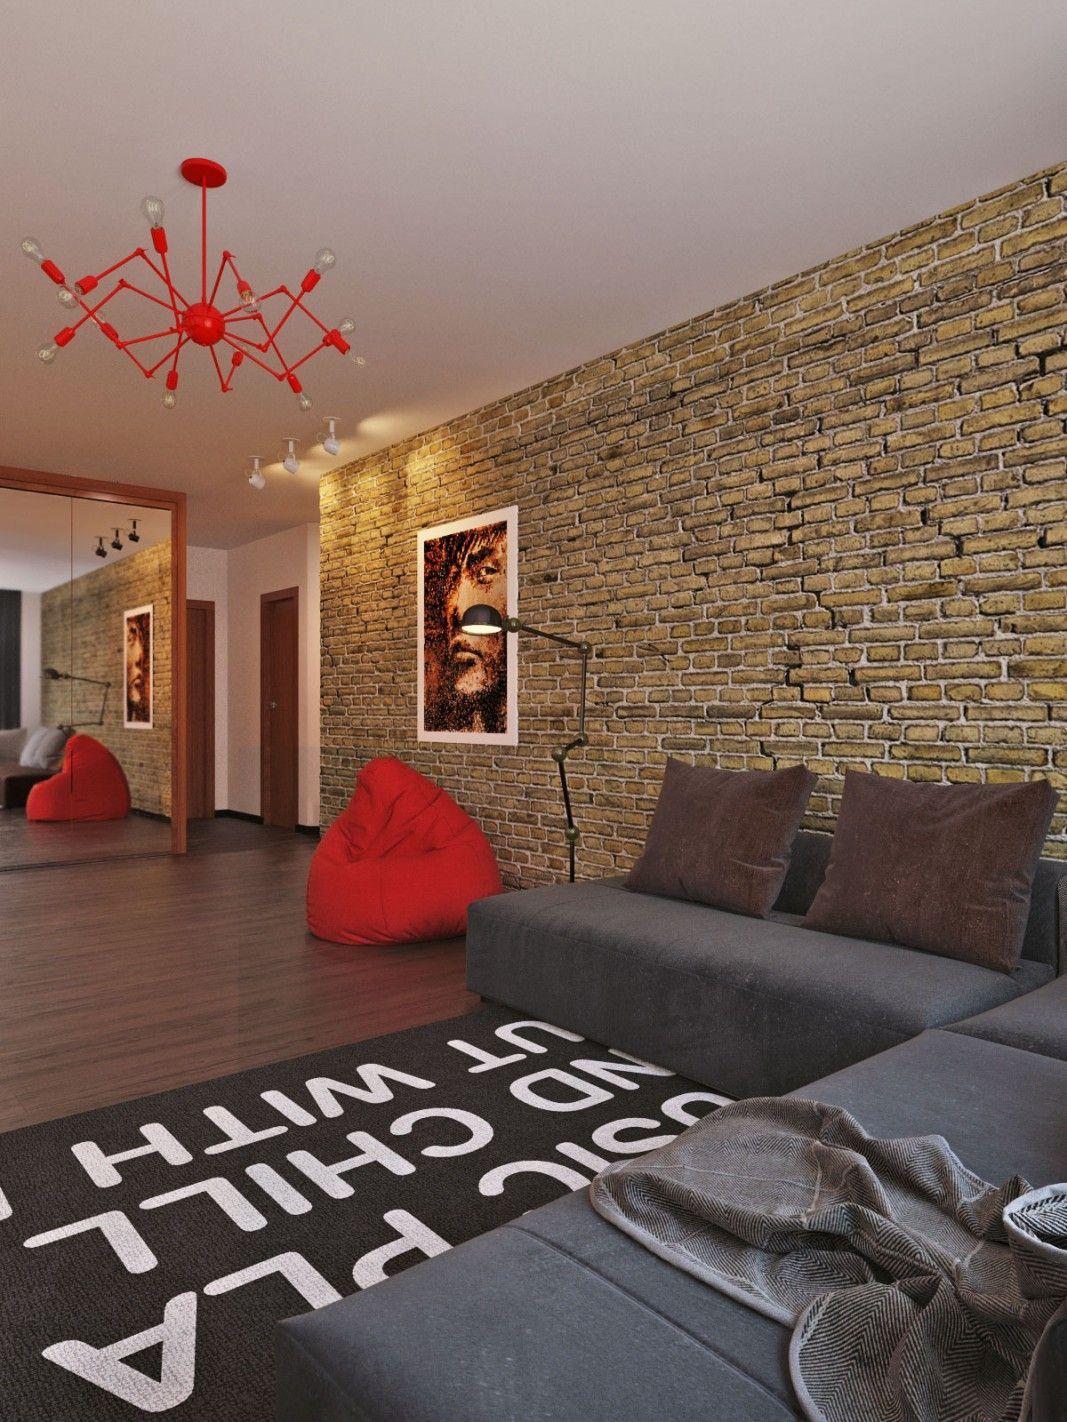 3D Design Architectural Visualization & Rendering | Interior rendering / Loft Apartment